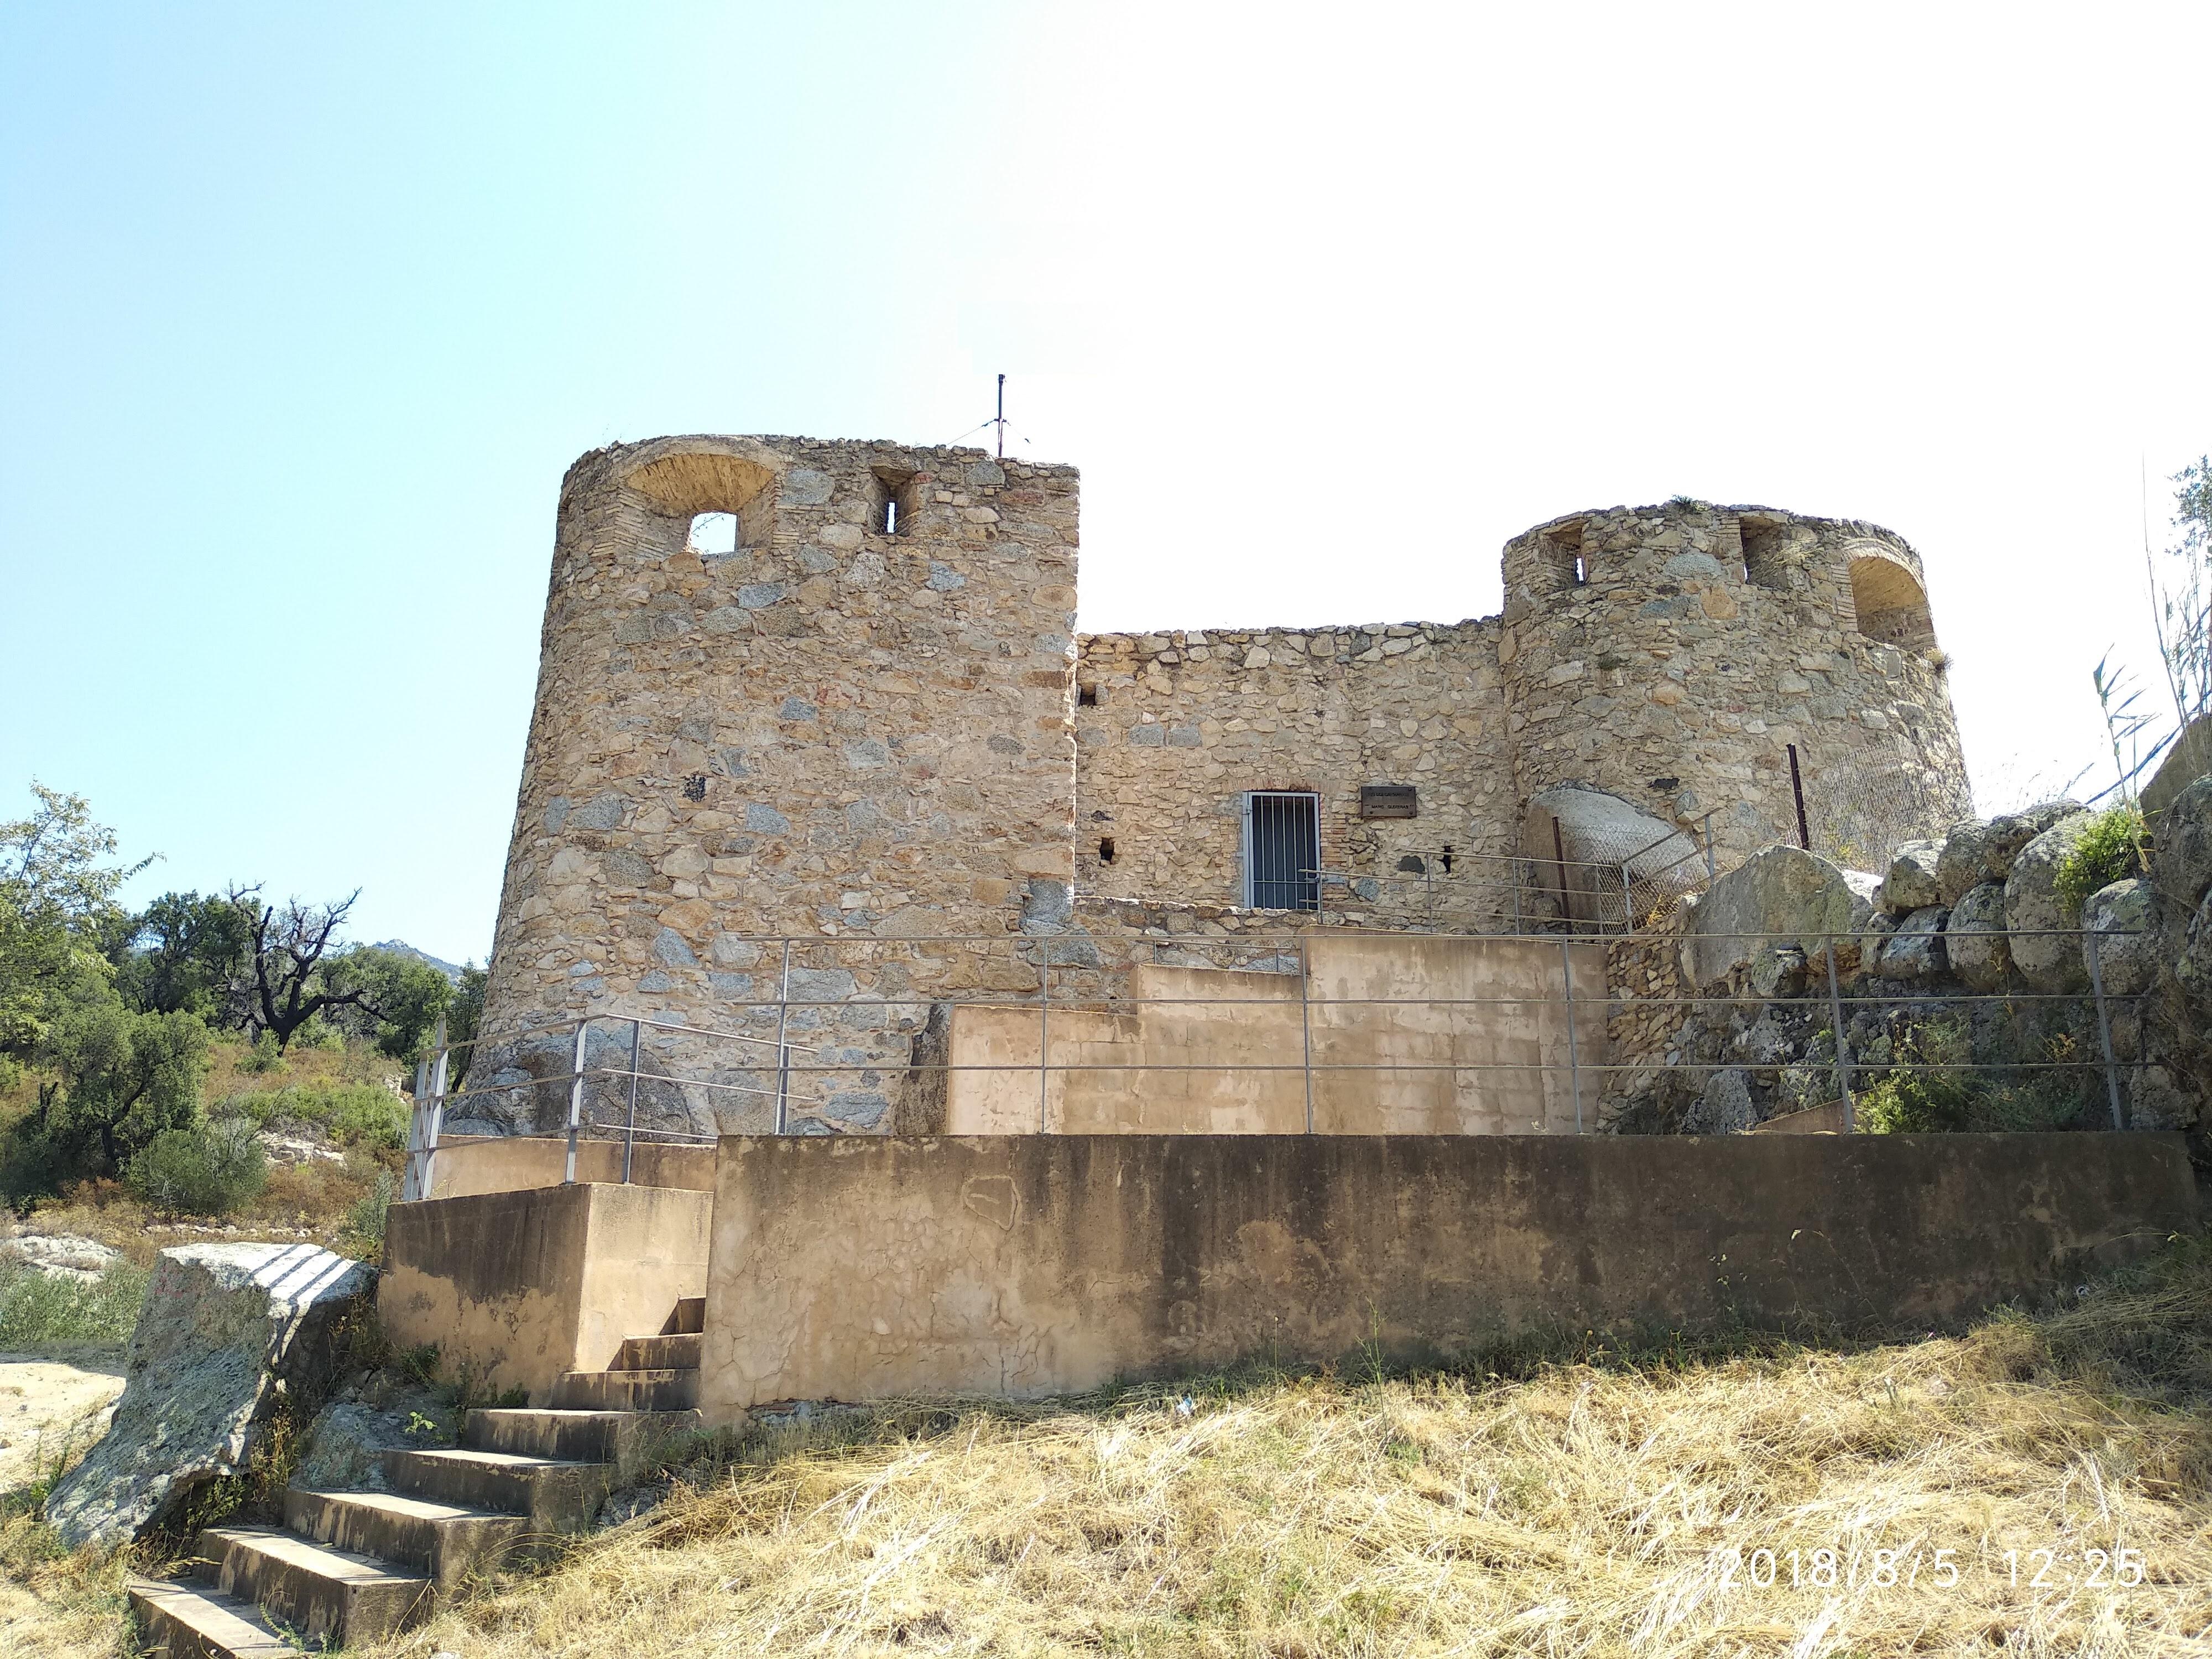 telegrafia optica barcelona-la jonquera Torre La jonquera